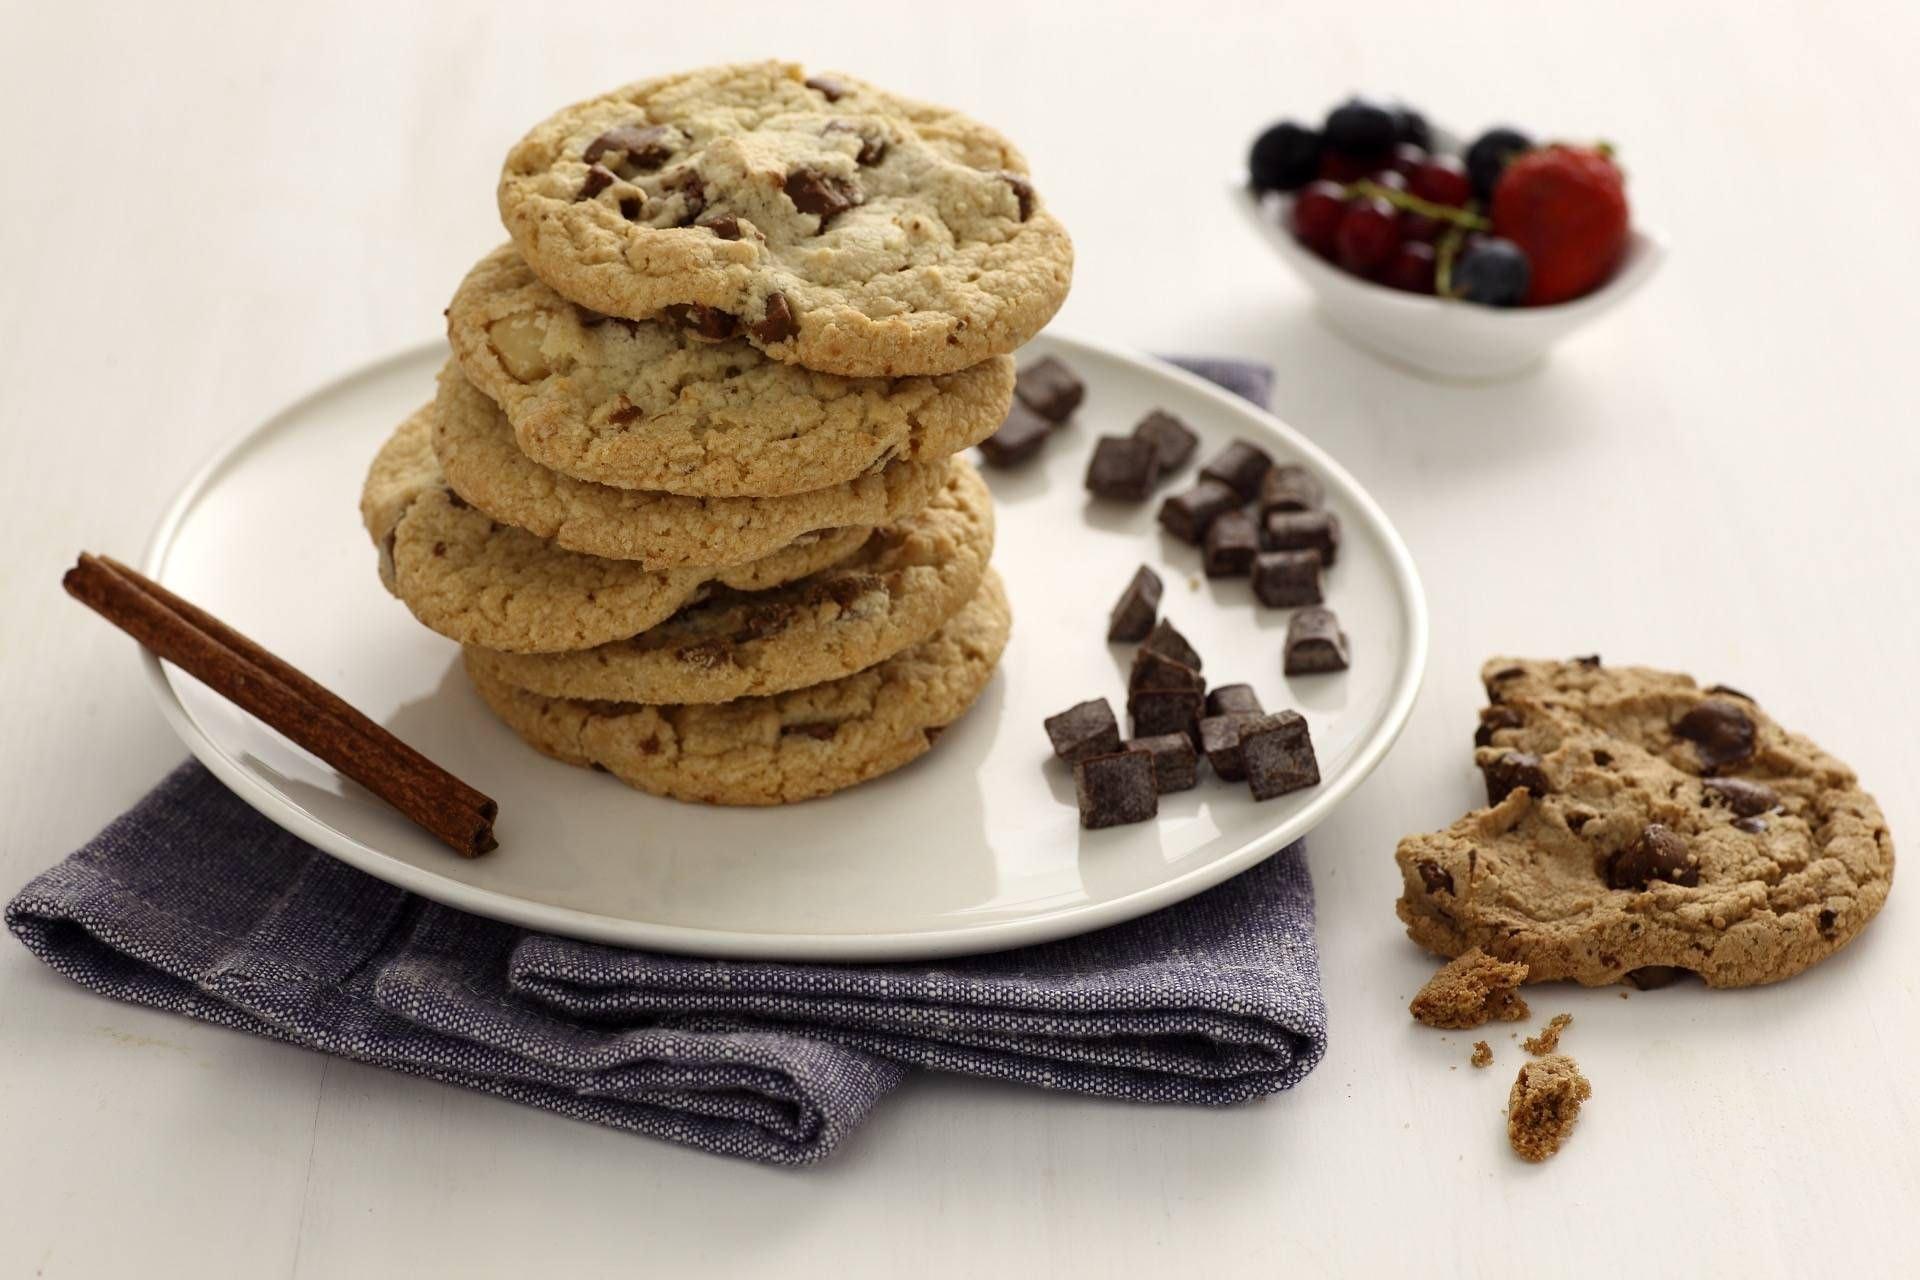 Cookies al cioccolato - Parmalat